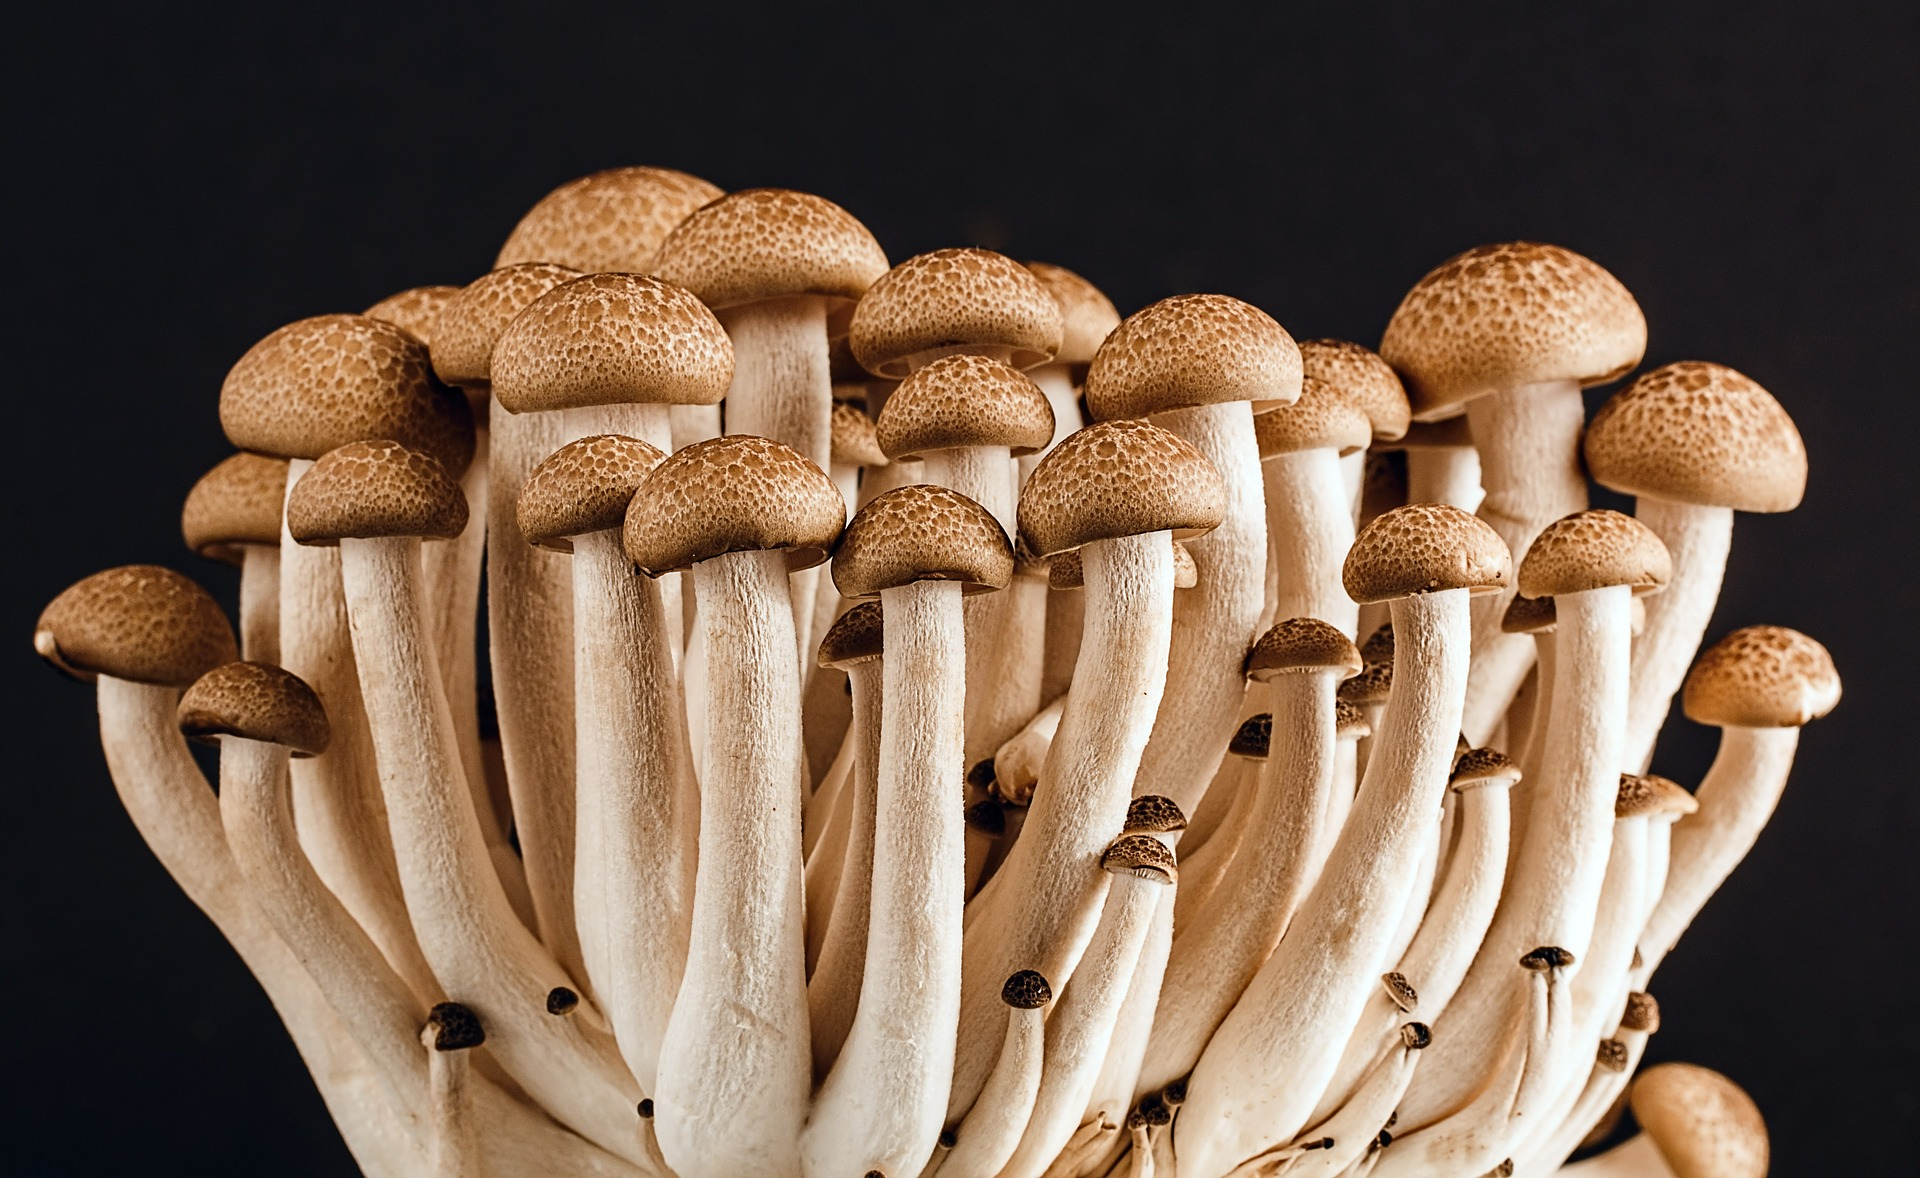 mushroom-389421_1920.jpg